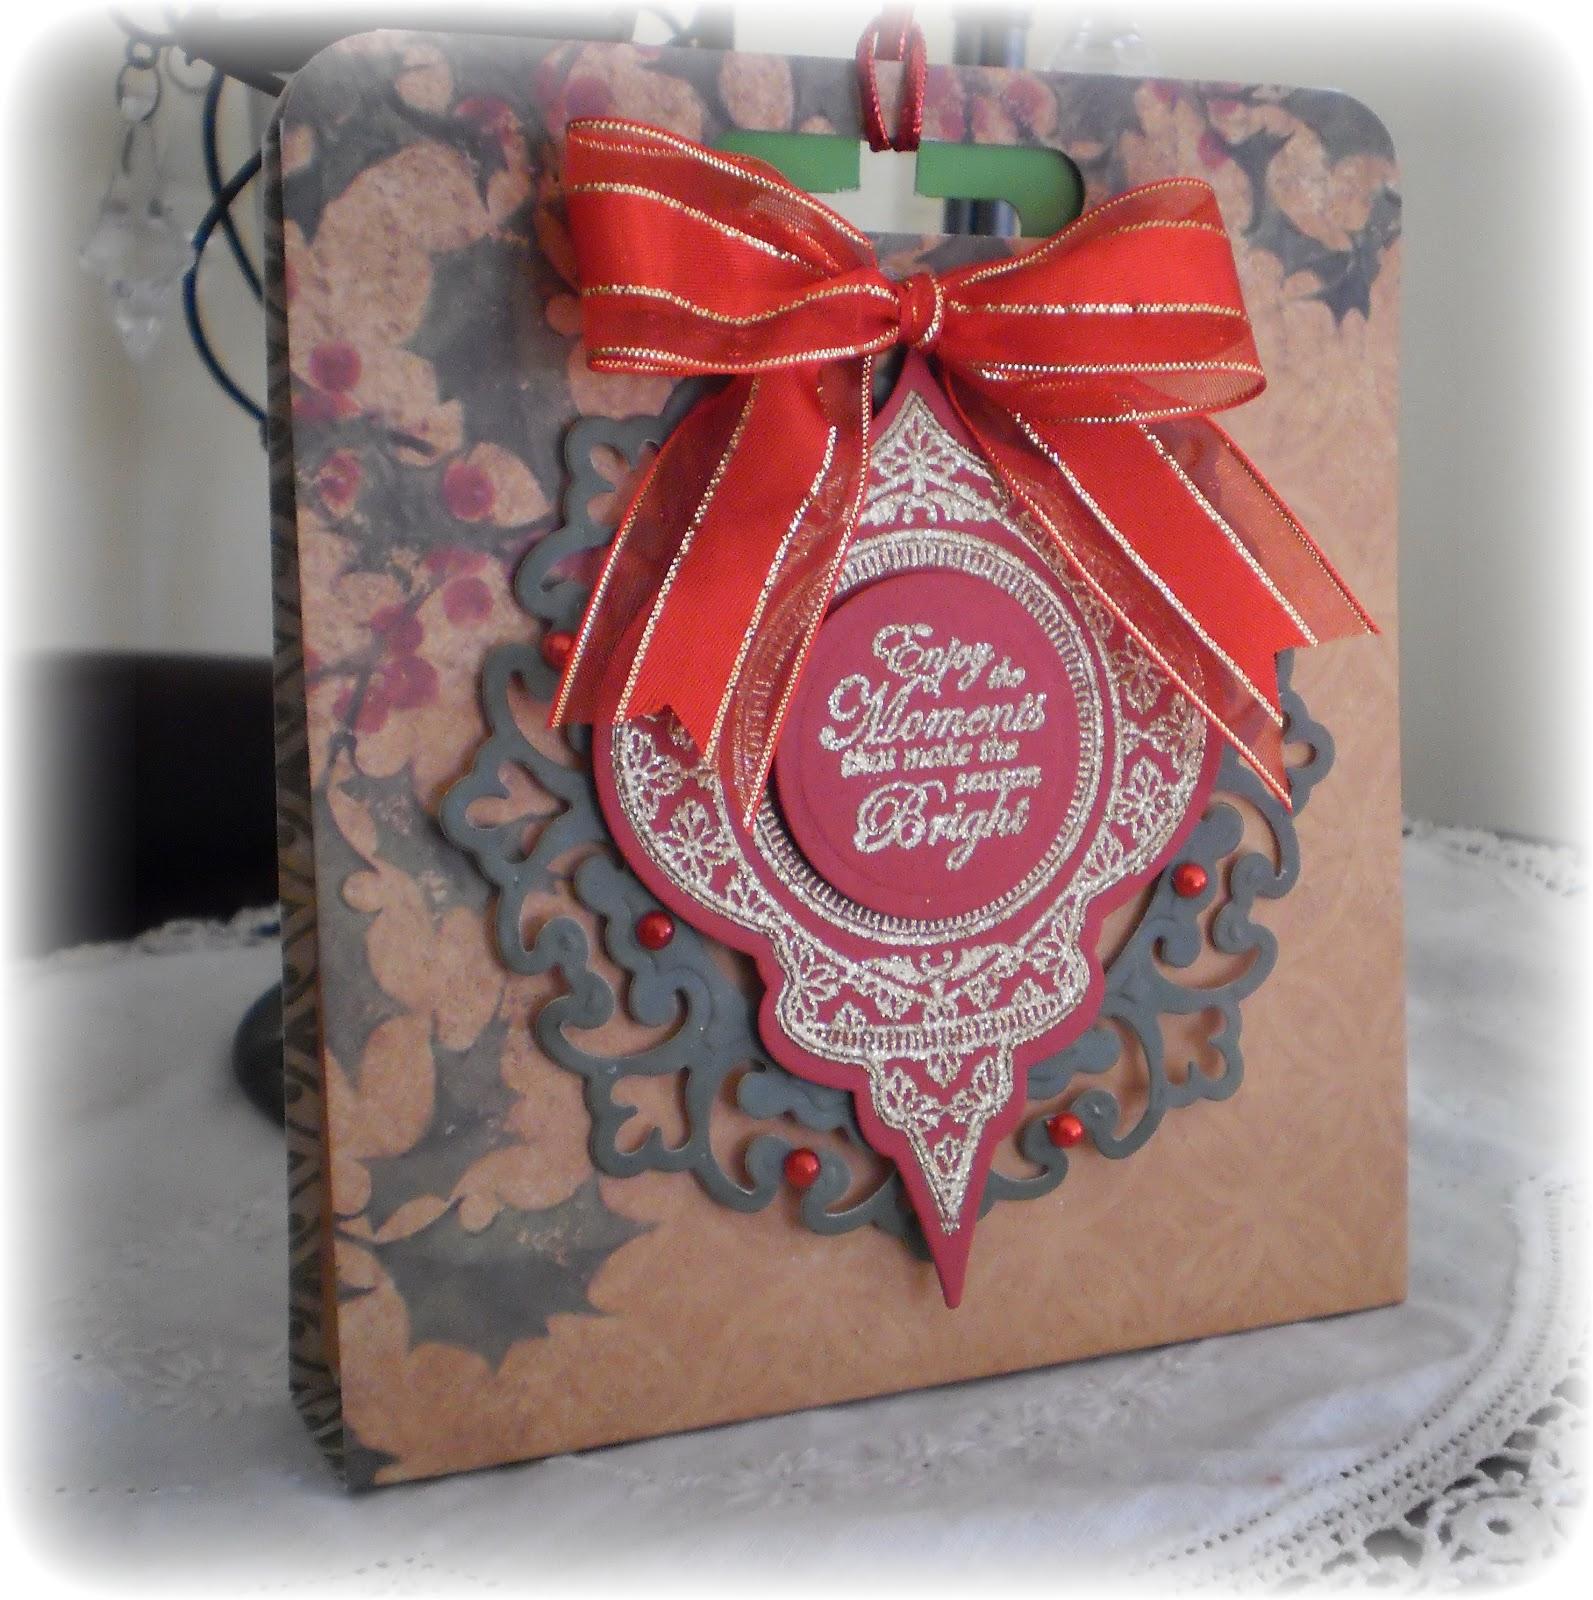 Sew Creative: Gift Card Holder